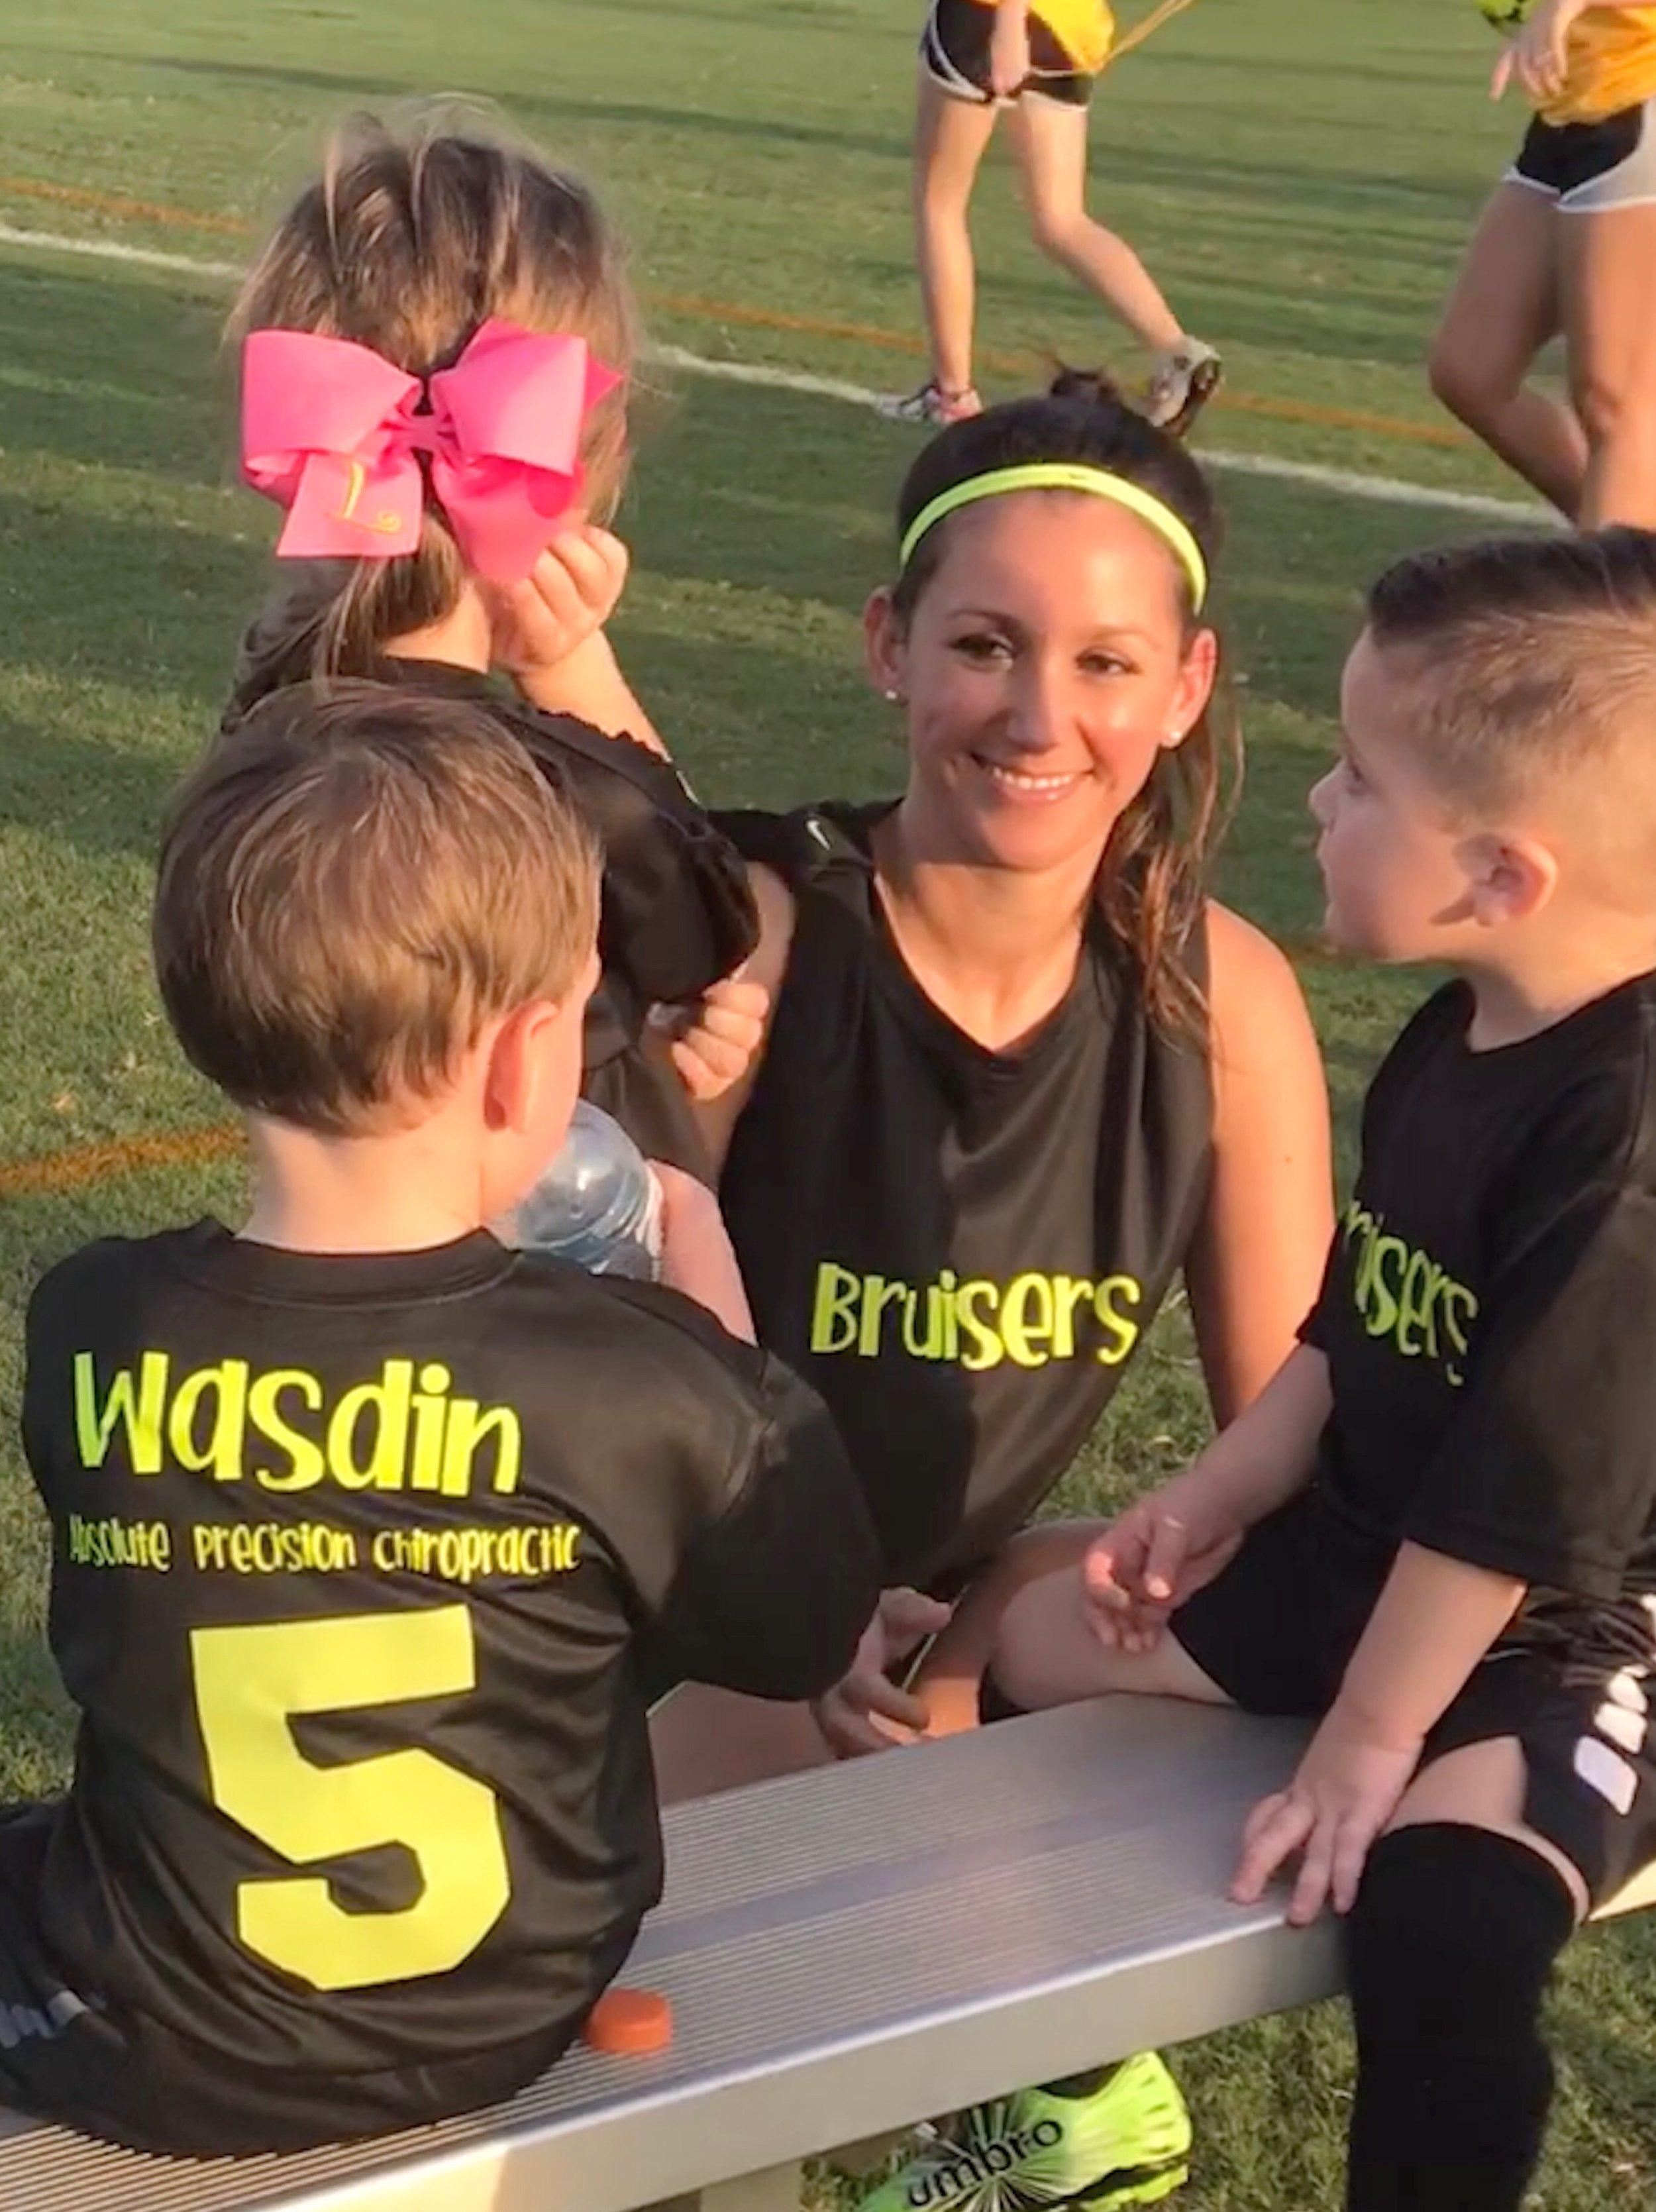 Coach Jordan (daughter-in-law) rallies the troops